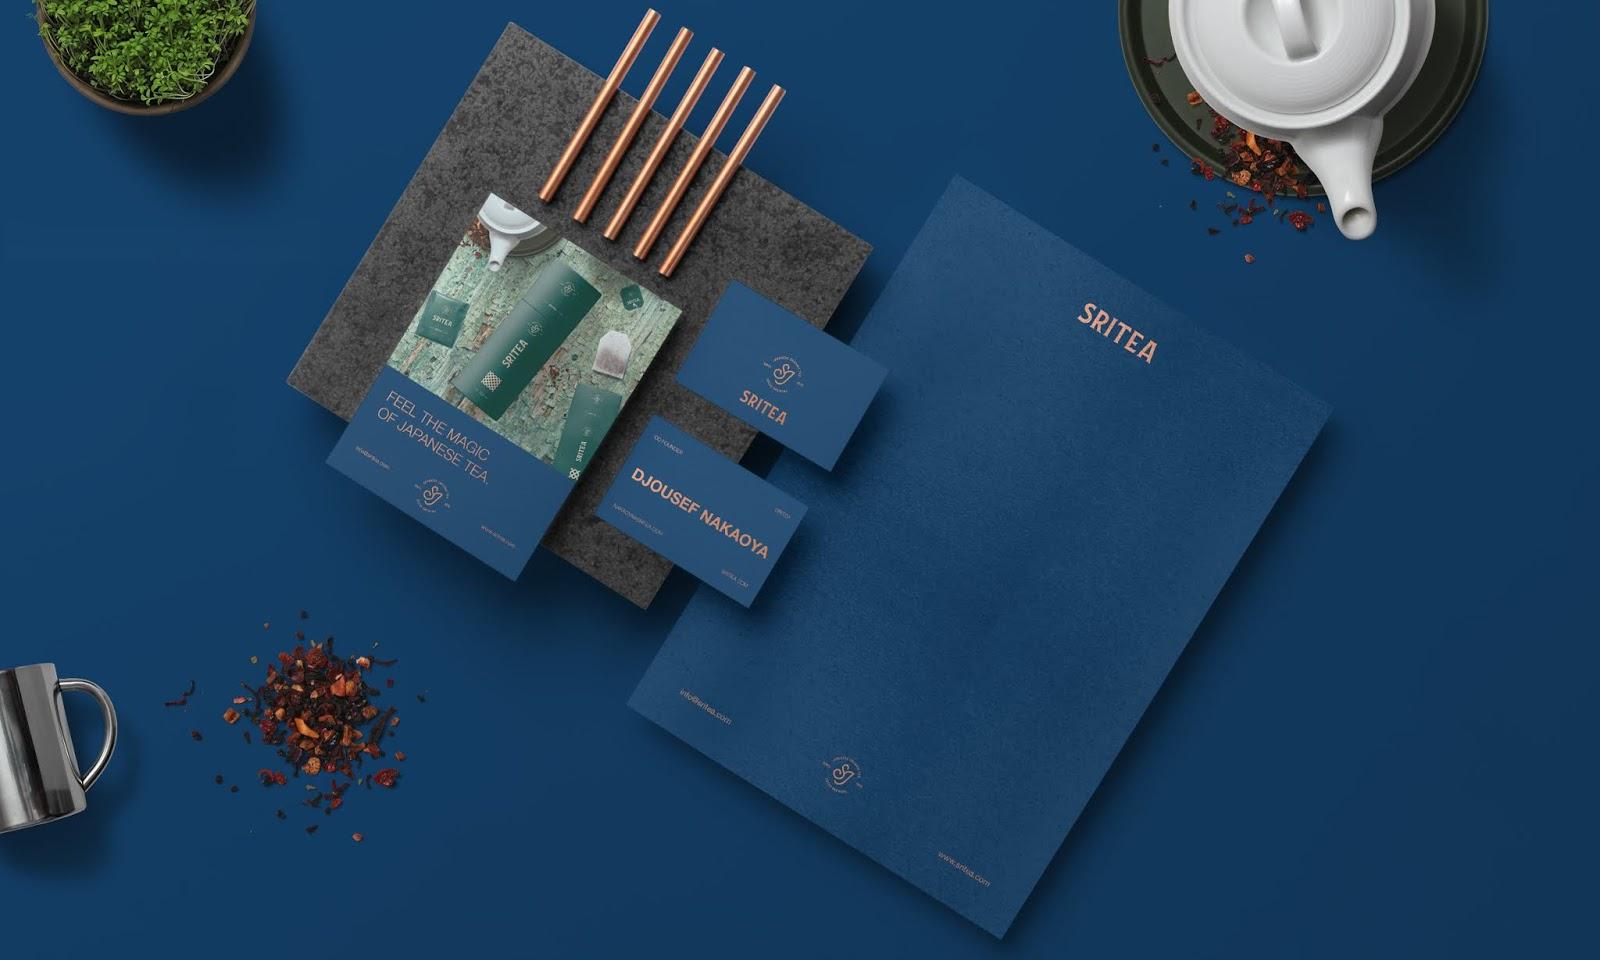 SriTea茶包装设计